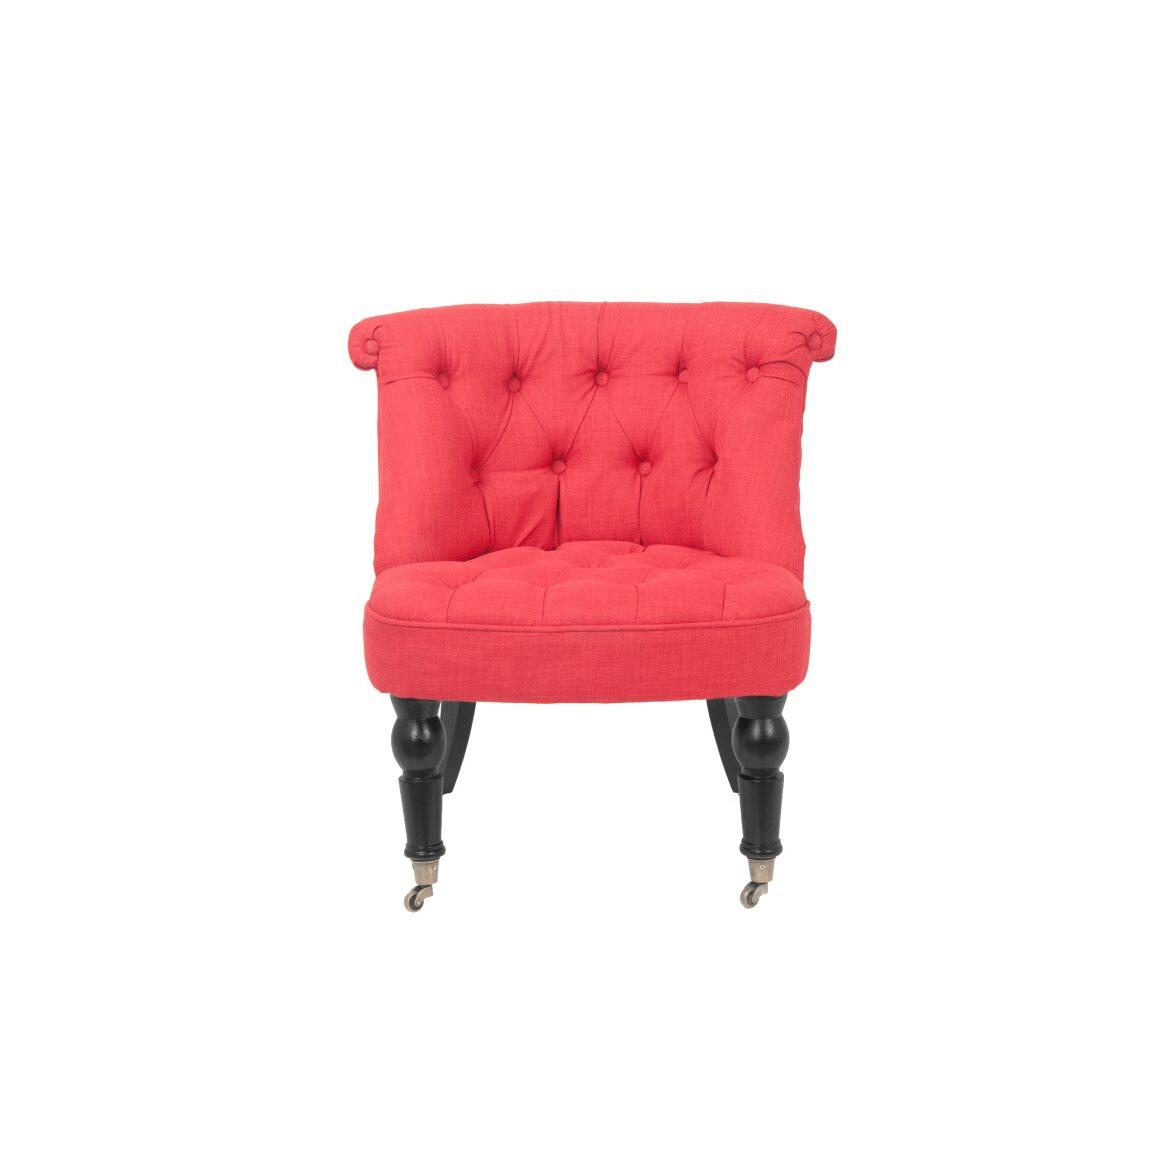 Низкое кресло Aviana red | Маленькие кресла Kingsby